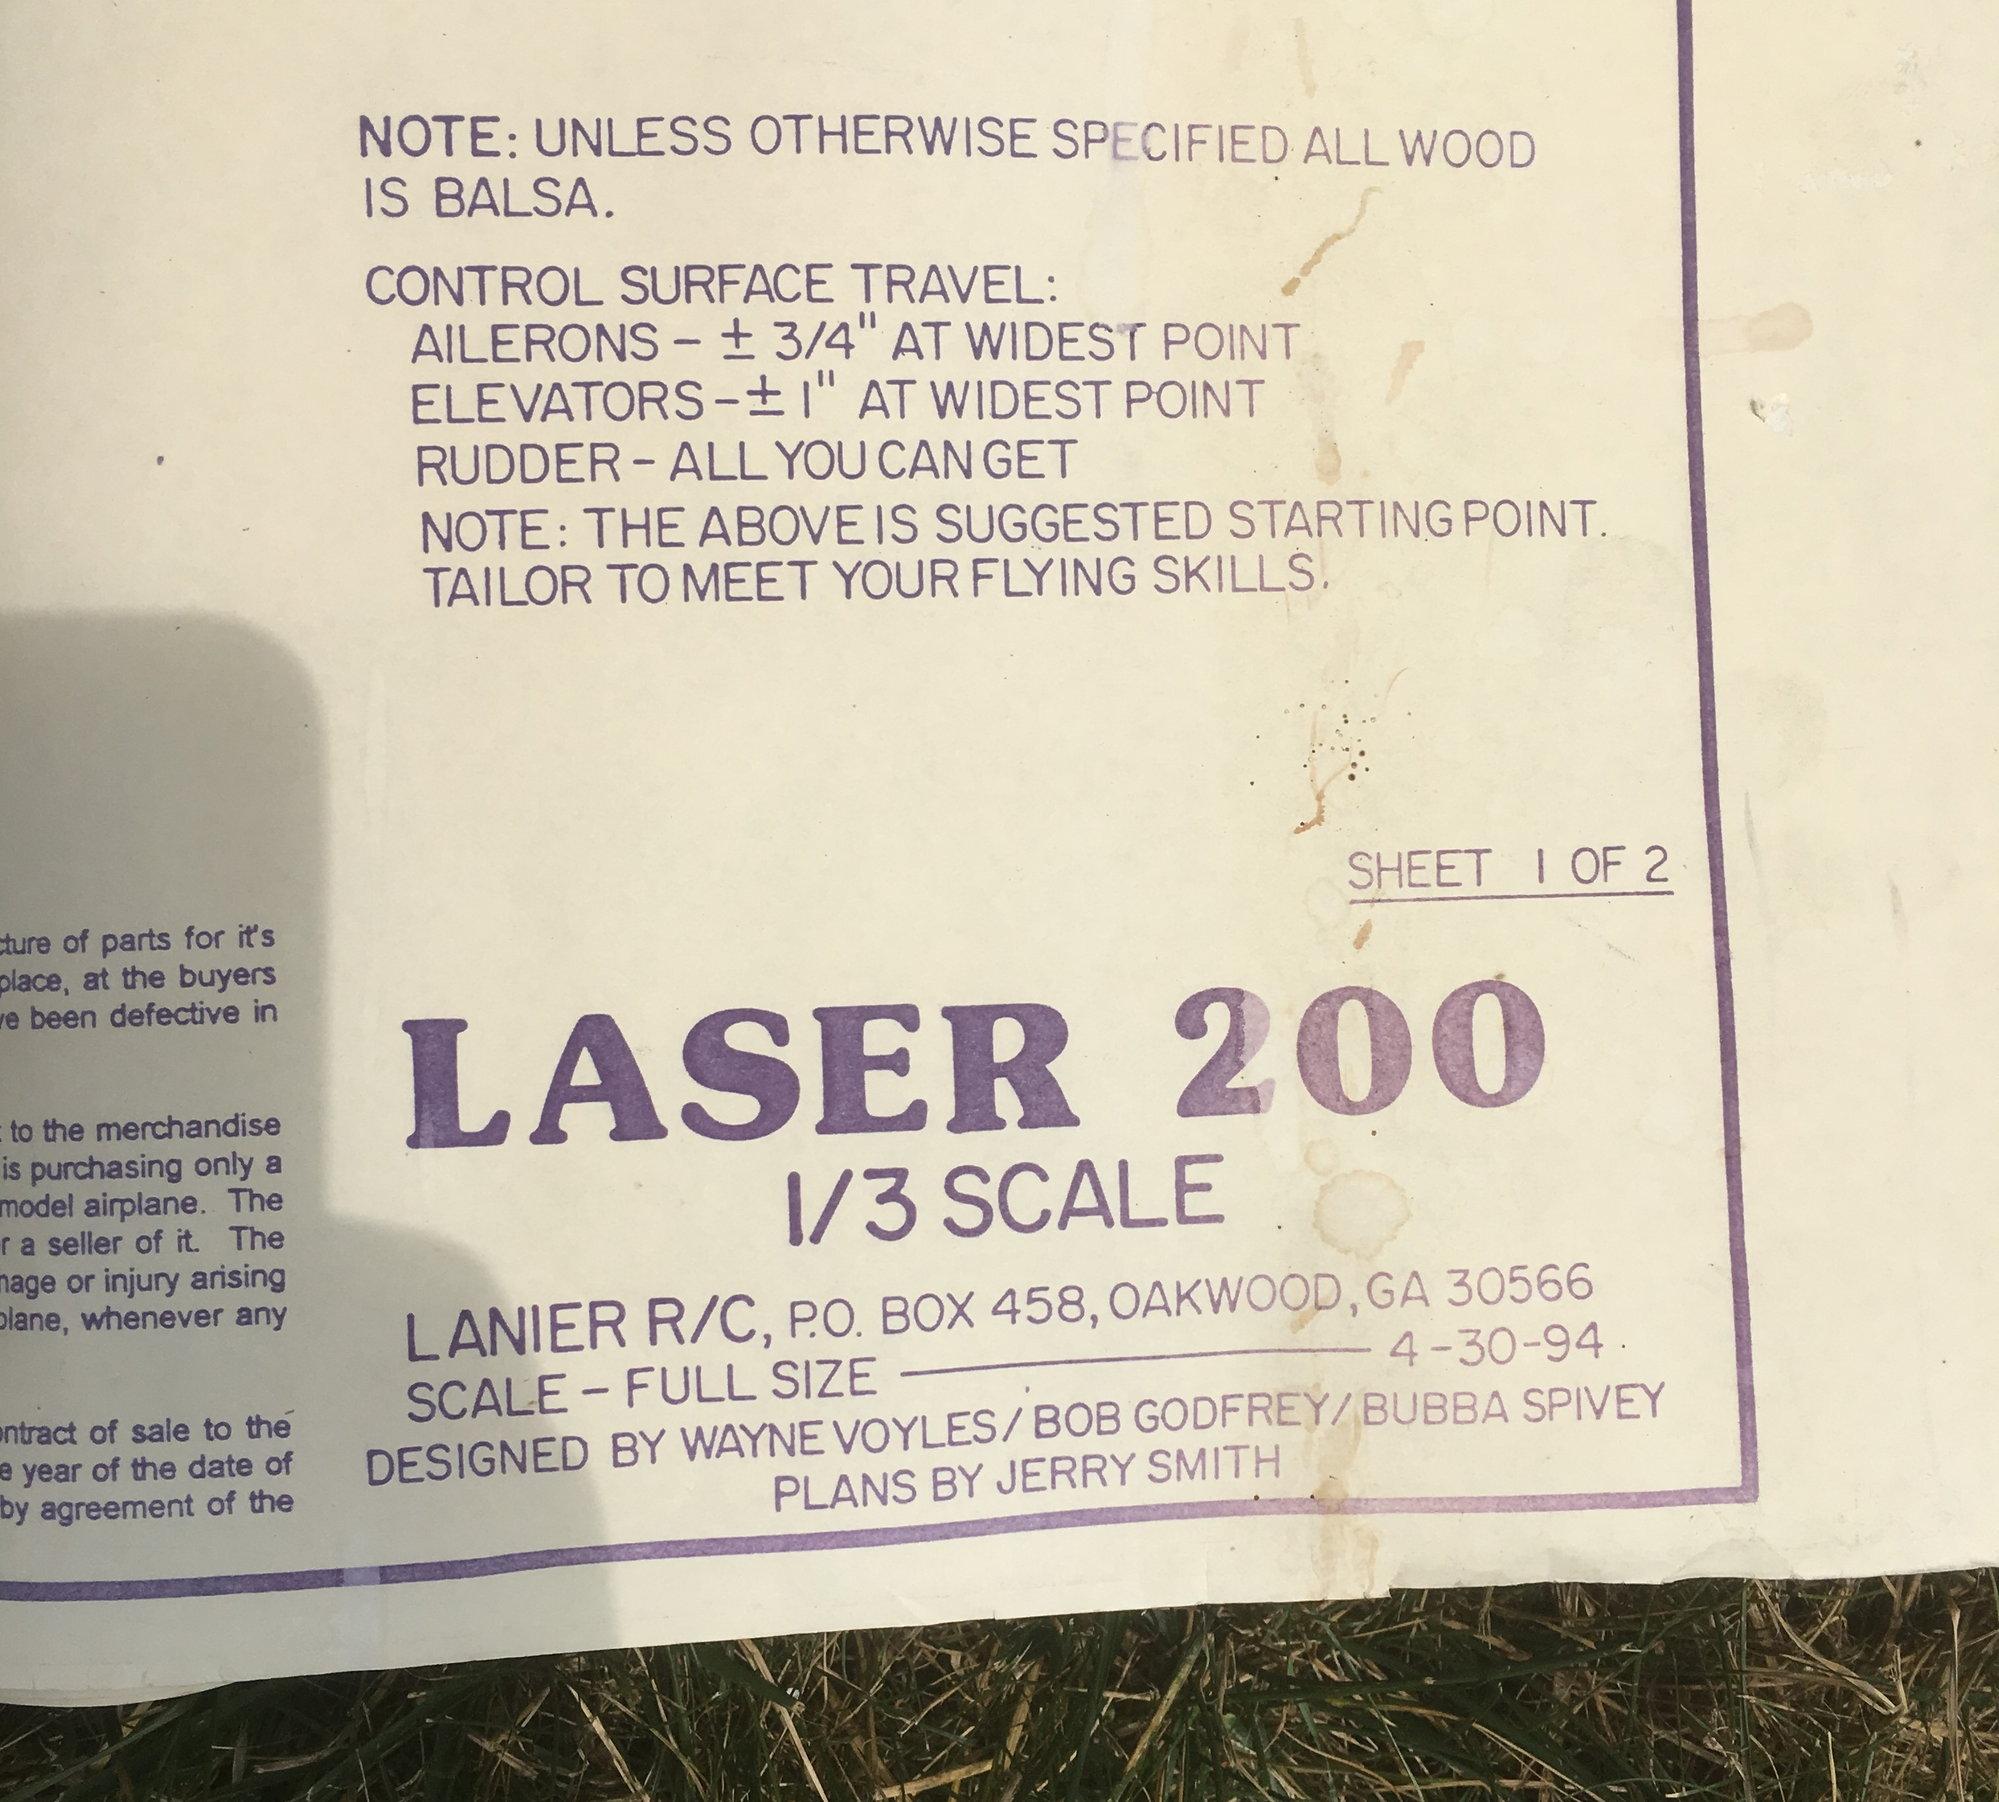 1/3 scale Laser 200 - Godfrey / Lanier - TOLEDO SHOW